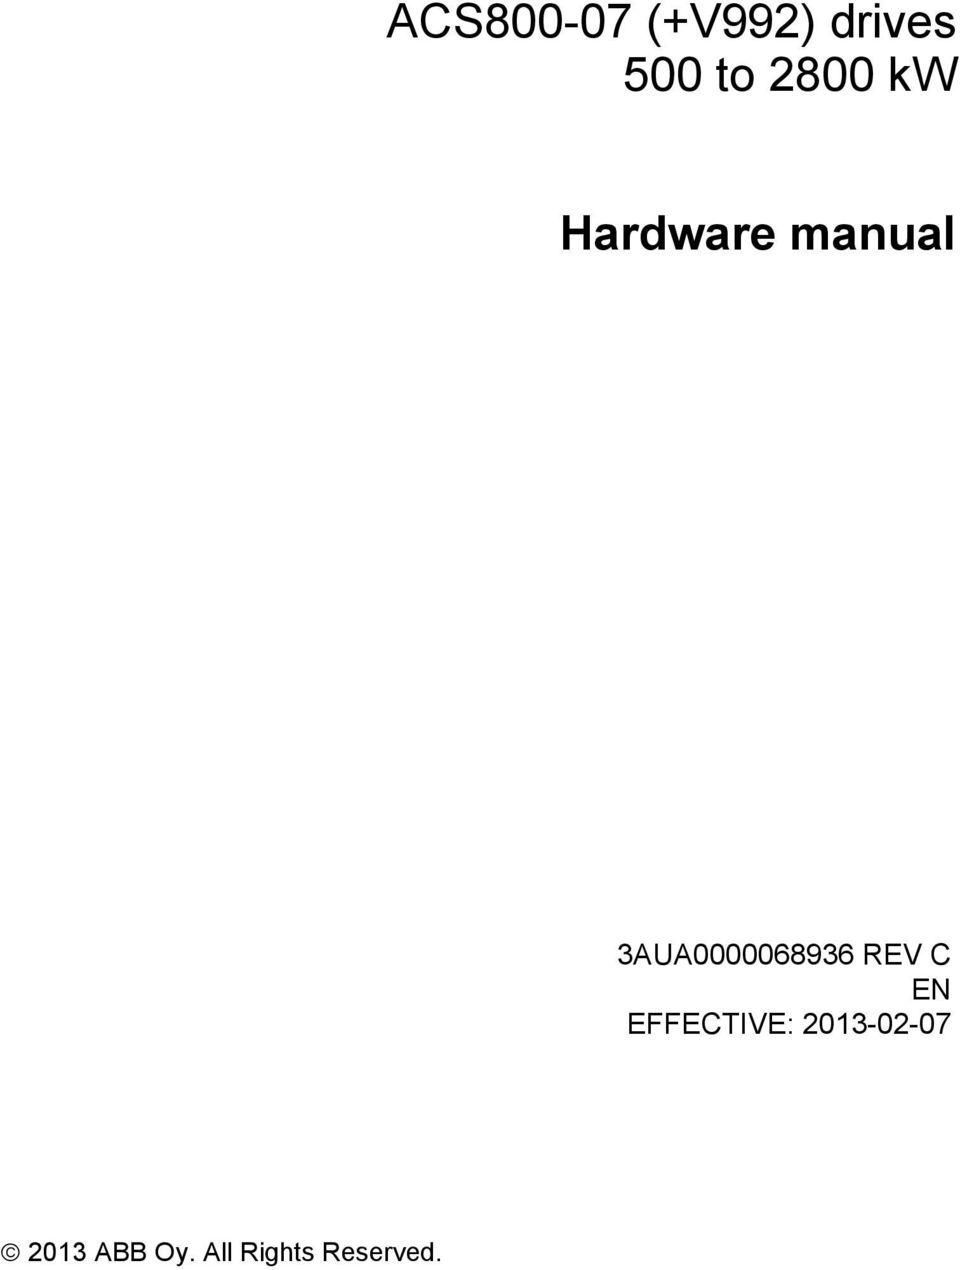 medium resolution of abb acs800 02 amp acs800 u2 drives hardware manual abb library for general purpose drives abb acs355 user manual pdf download hello pair vfds hi